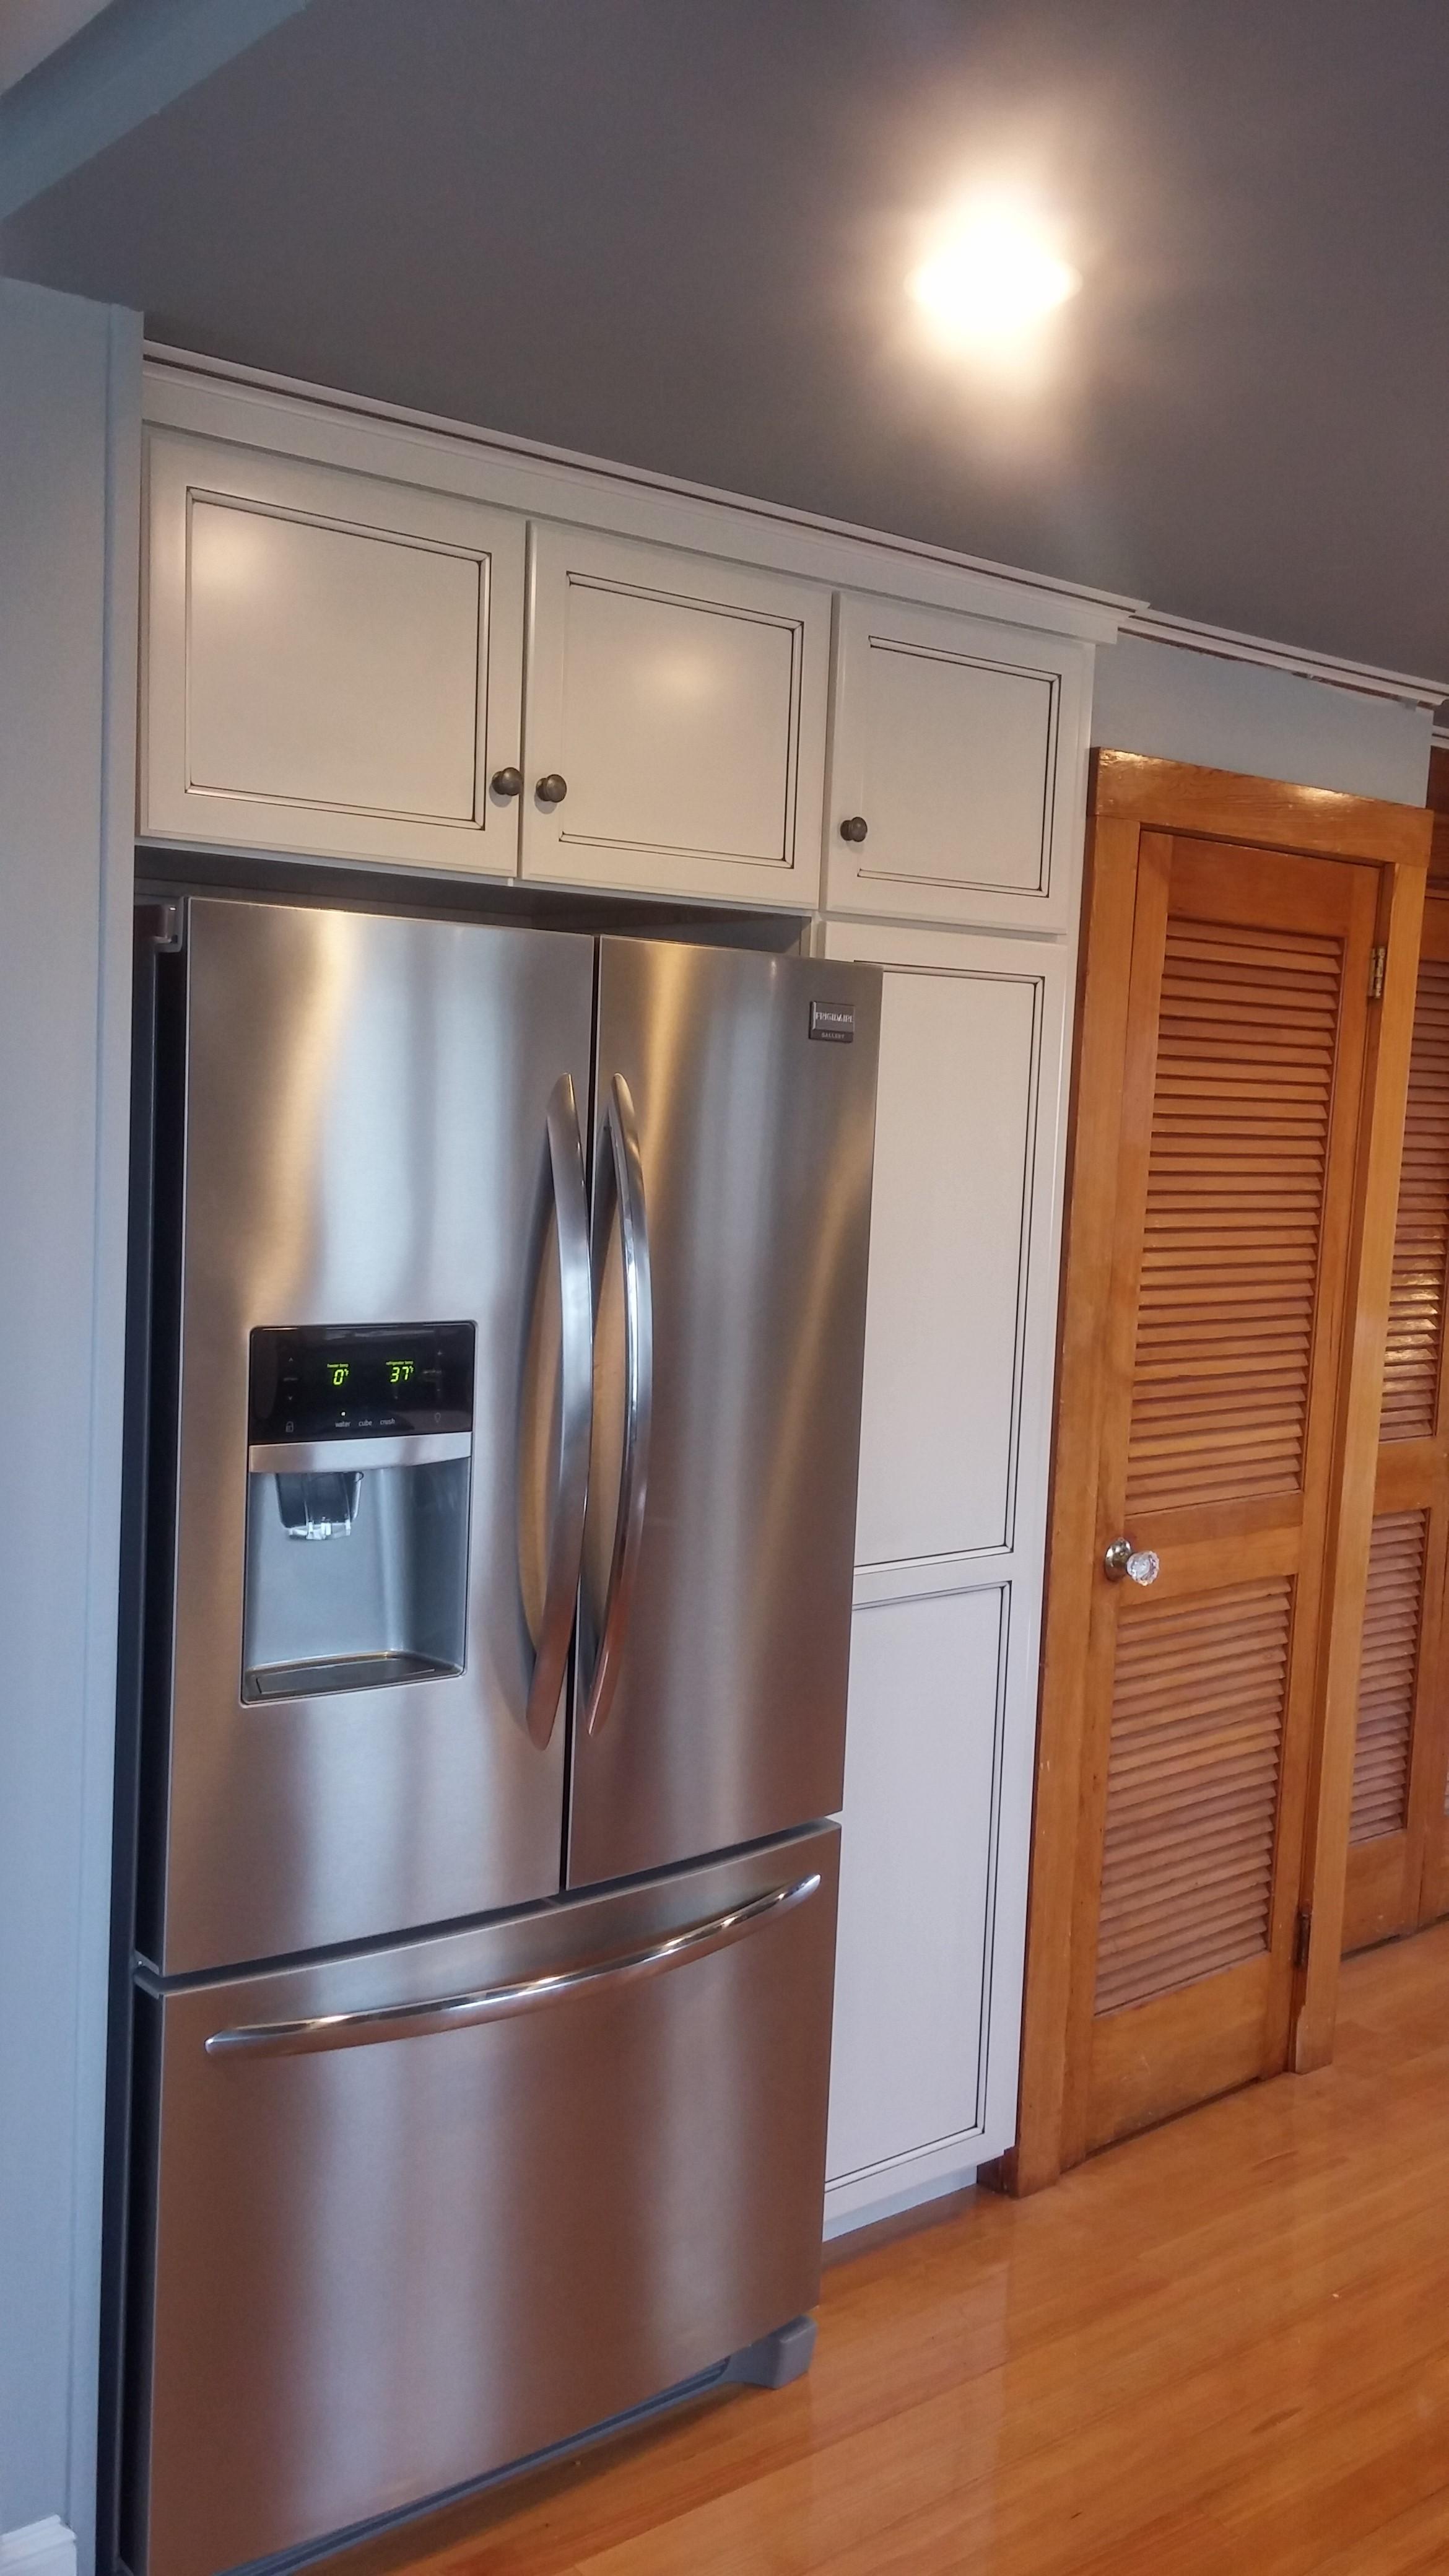 High End Appliances | Duxbury MA | South Shore Cabinet